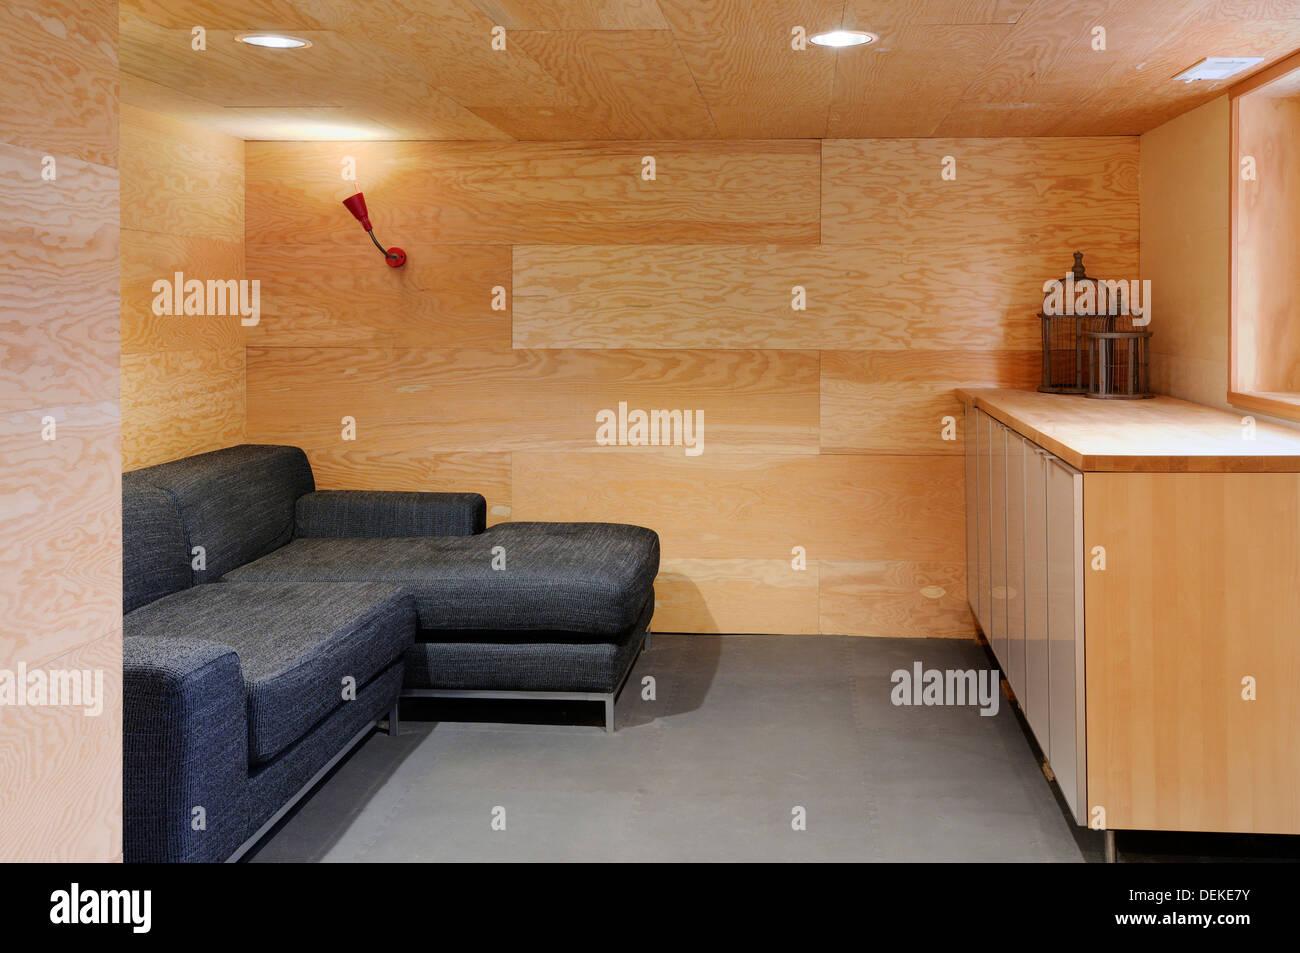 Sofa in wood paneled modern craftsman living room Stock ...